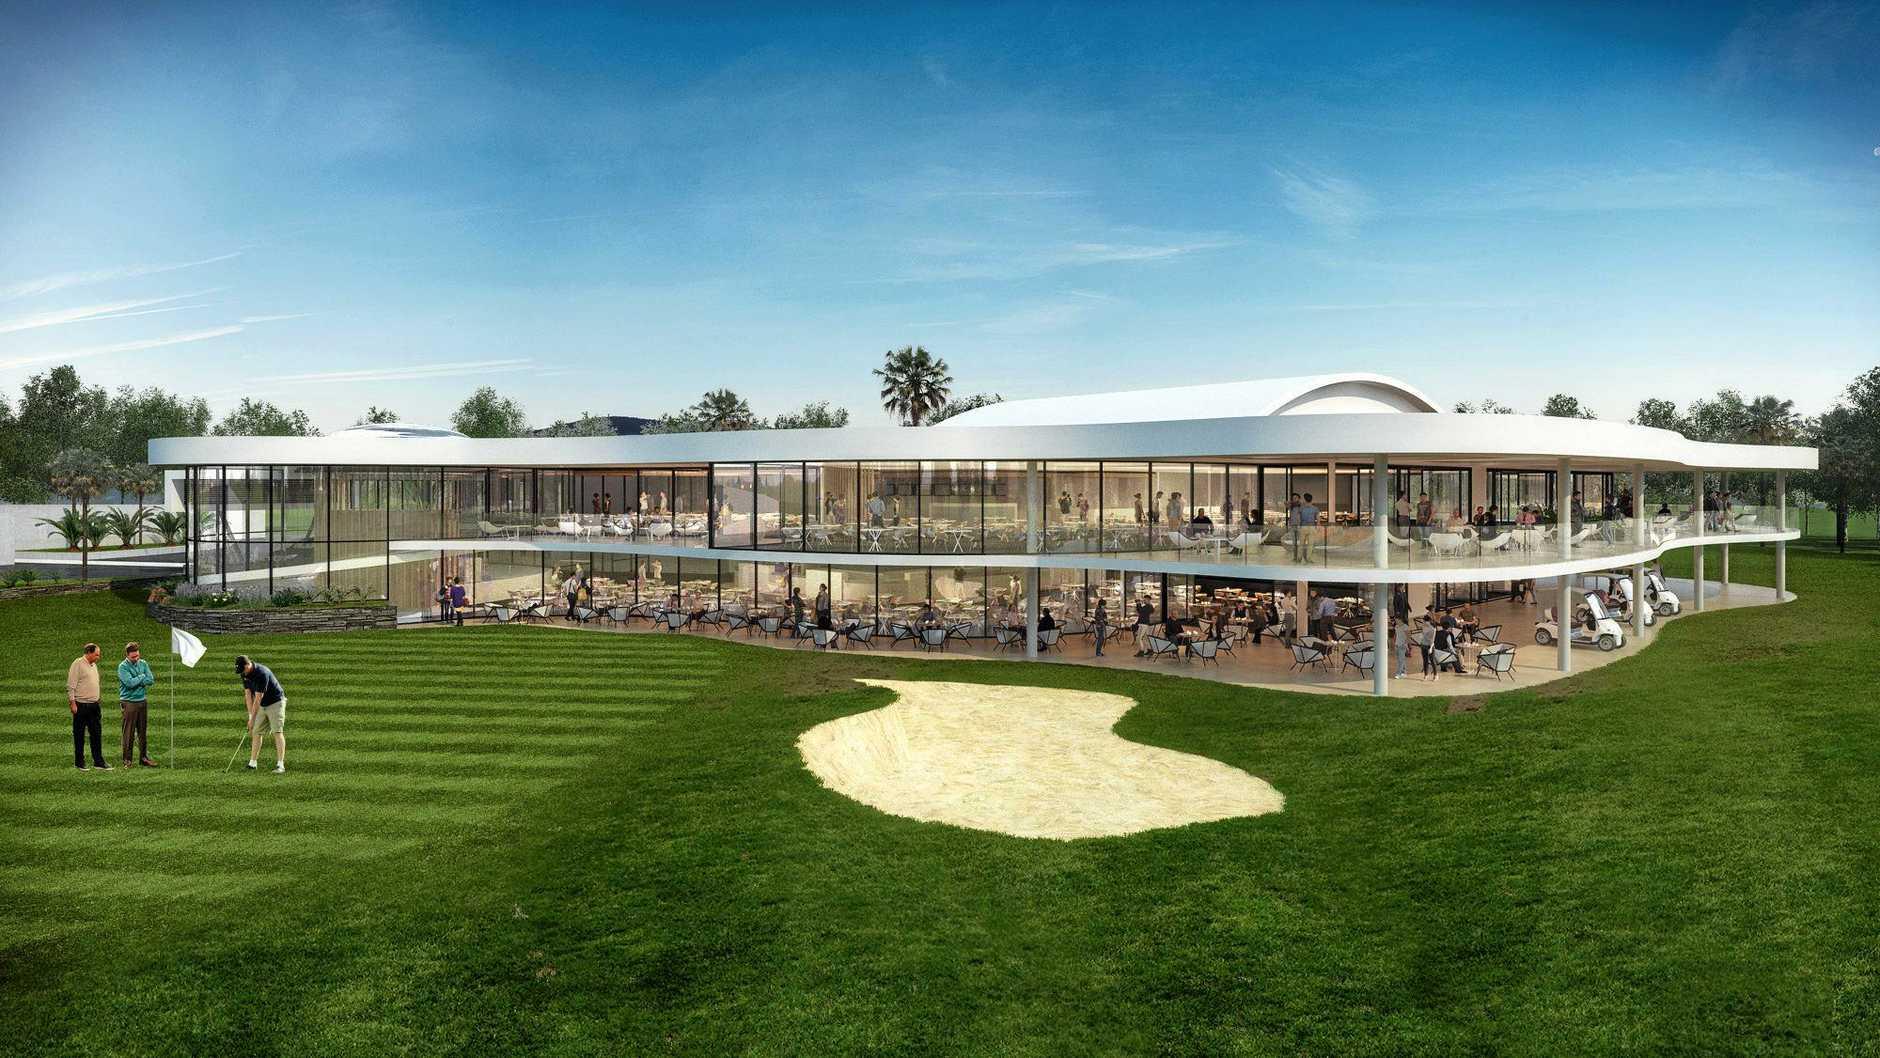 BIG PLANS: An artist's impression of Gympie RSL Club's proposed new golf club venue.